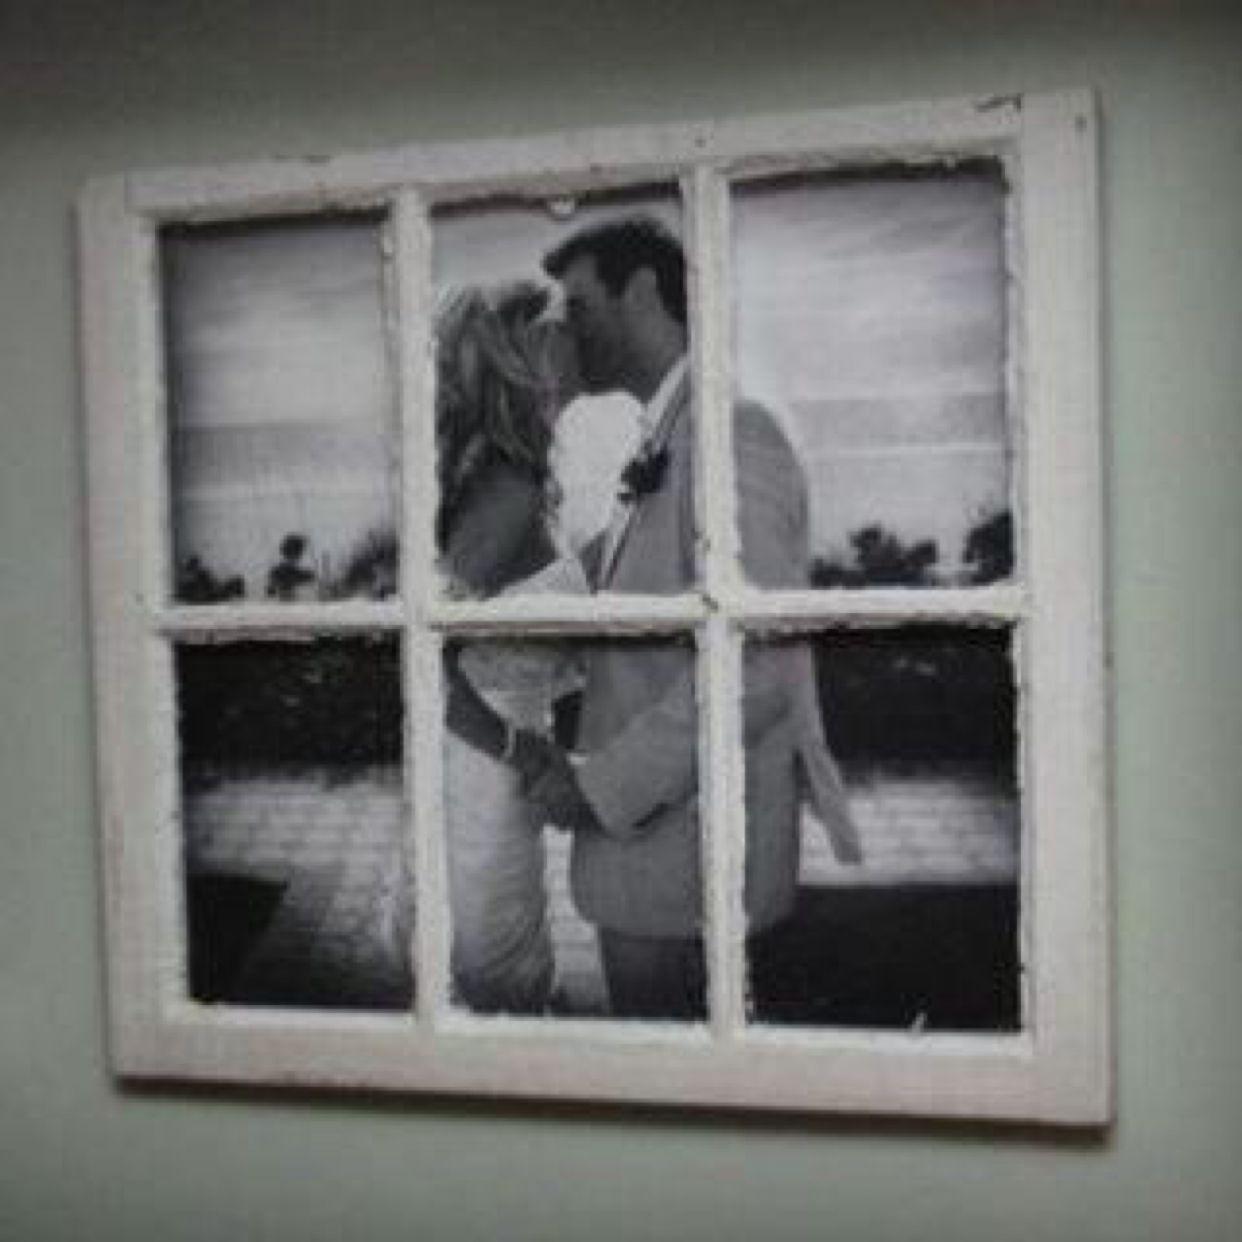 Window decor and more orange beach  pin by shayna lofton on my dream wedding  pinterest